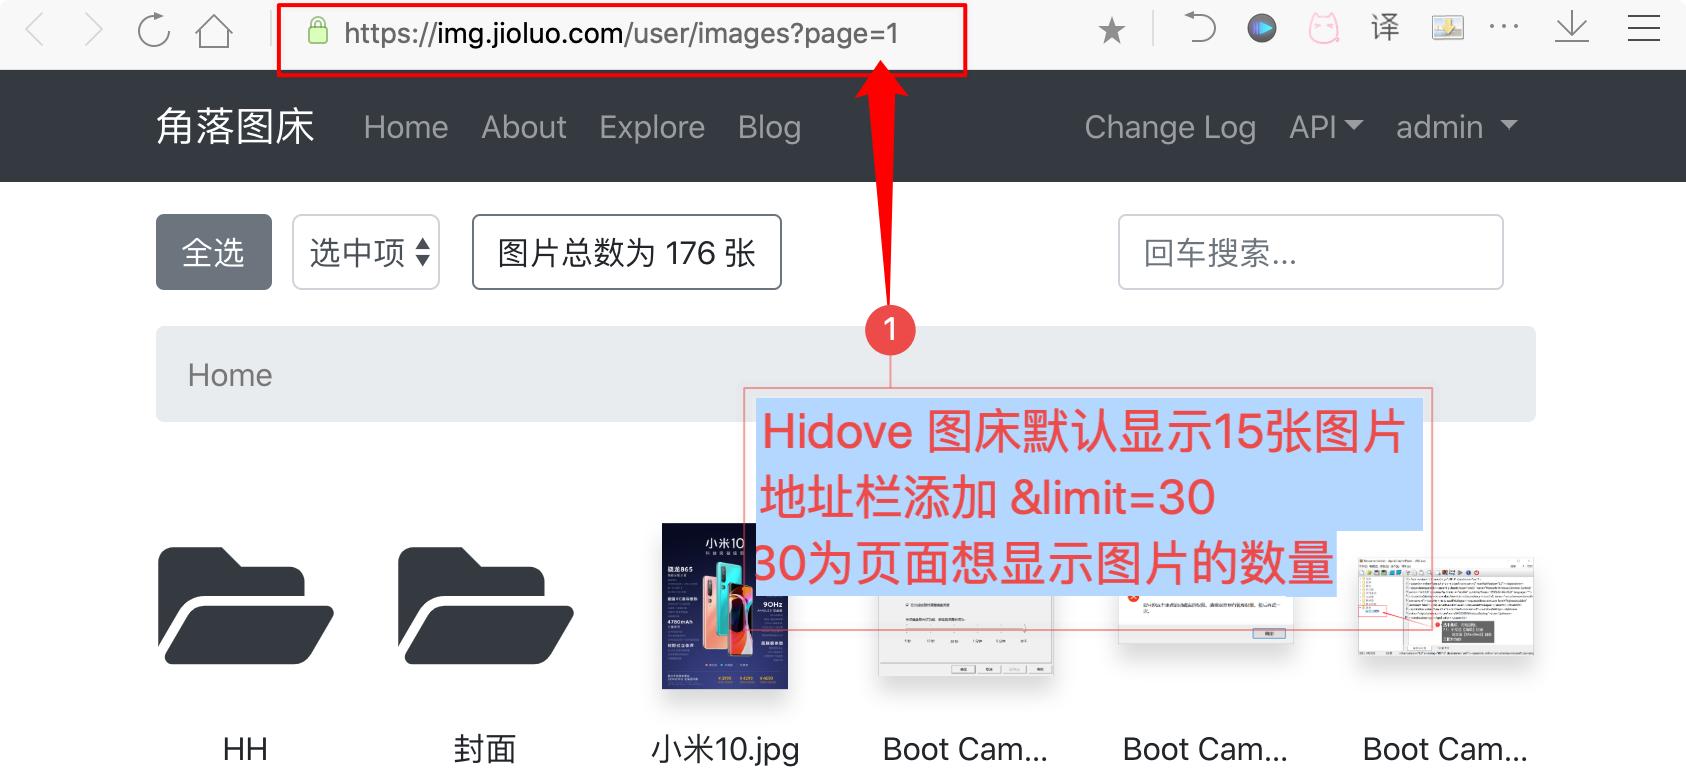 Hidove图床图库页面显示更多图片代码&limit=插图1